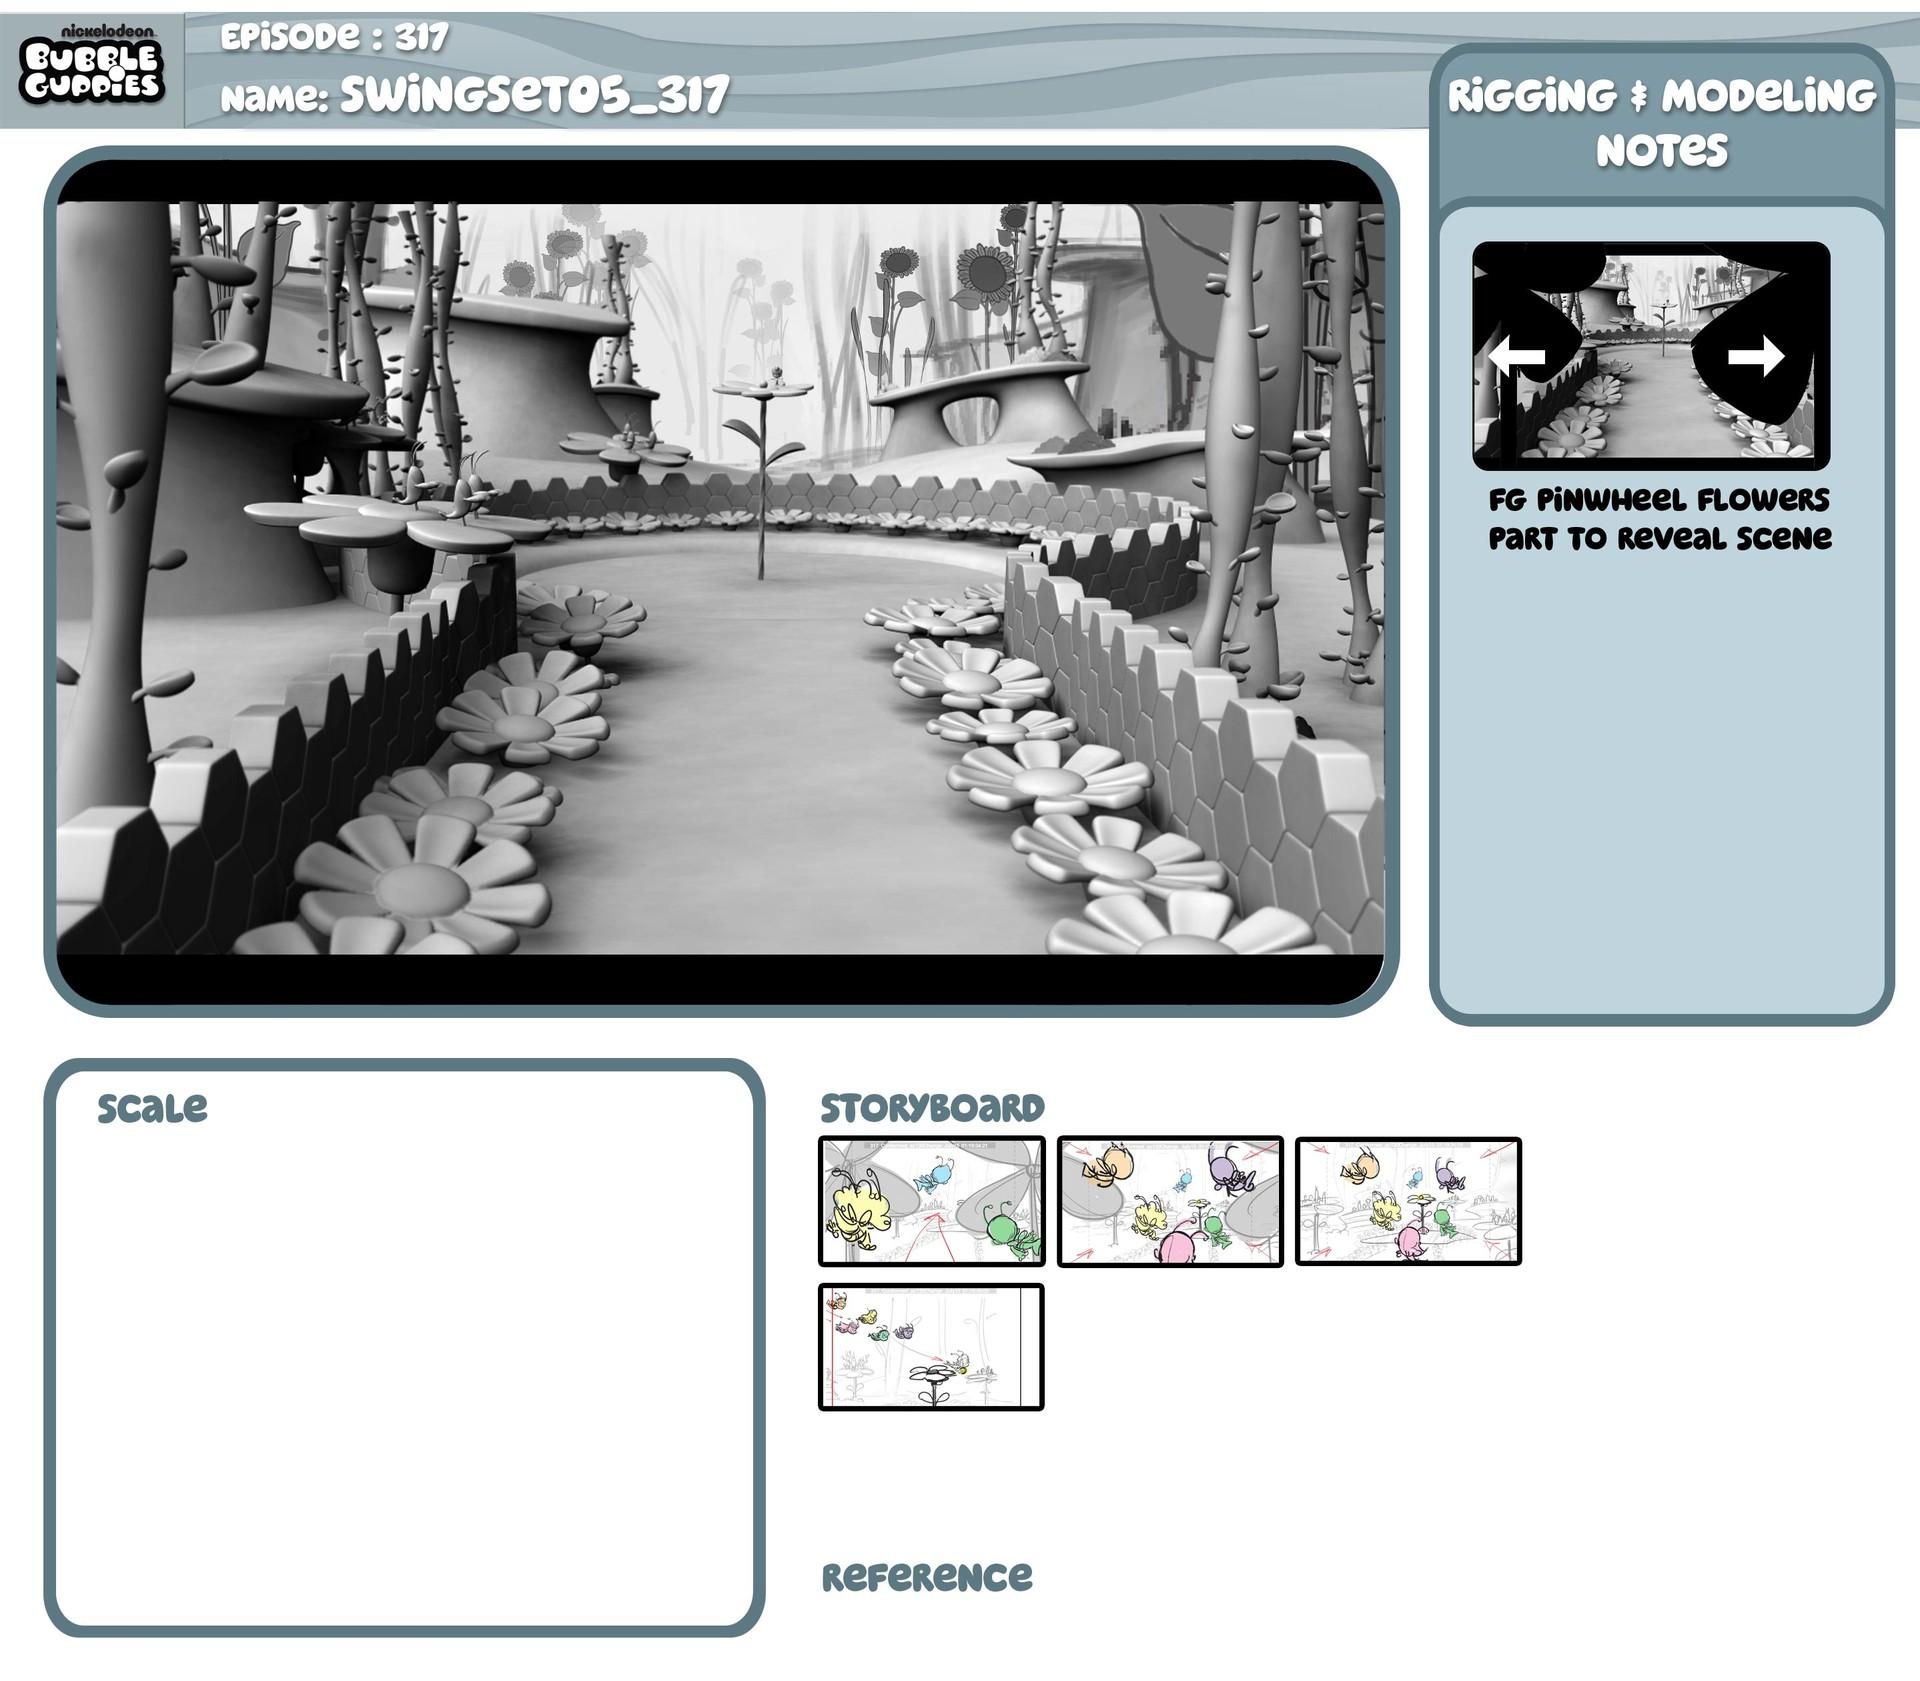 ArtStation - Various Set Designs for Bubble Guppies season 3